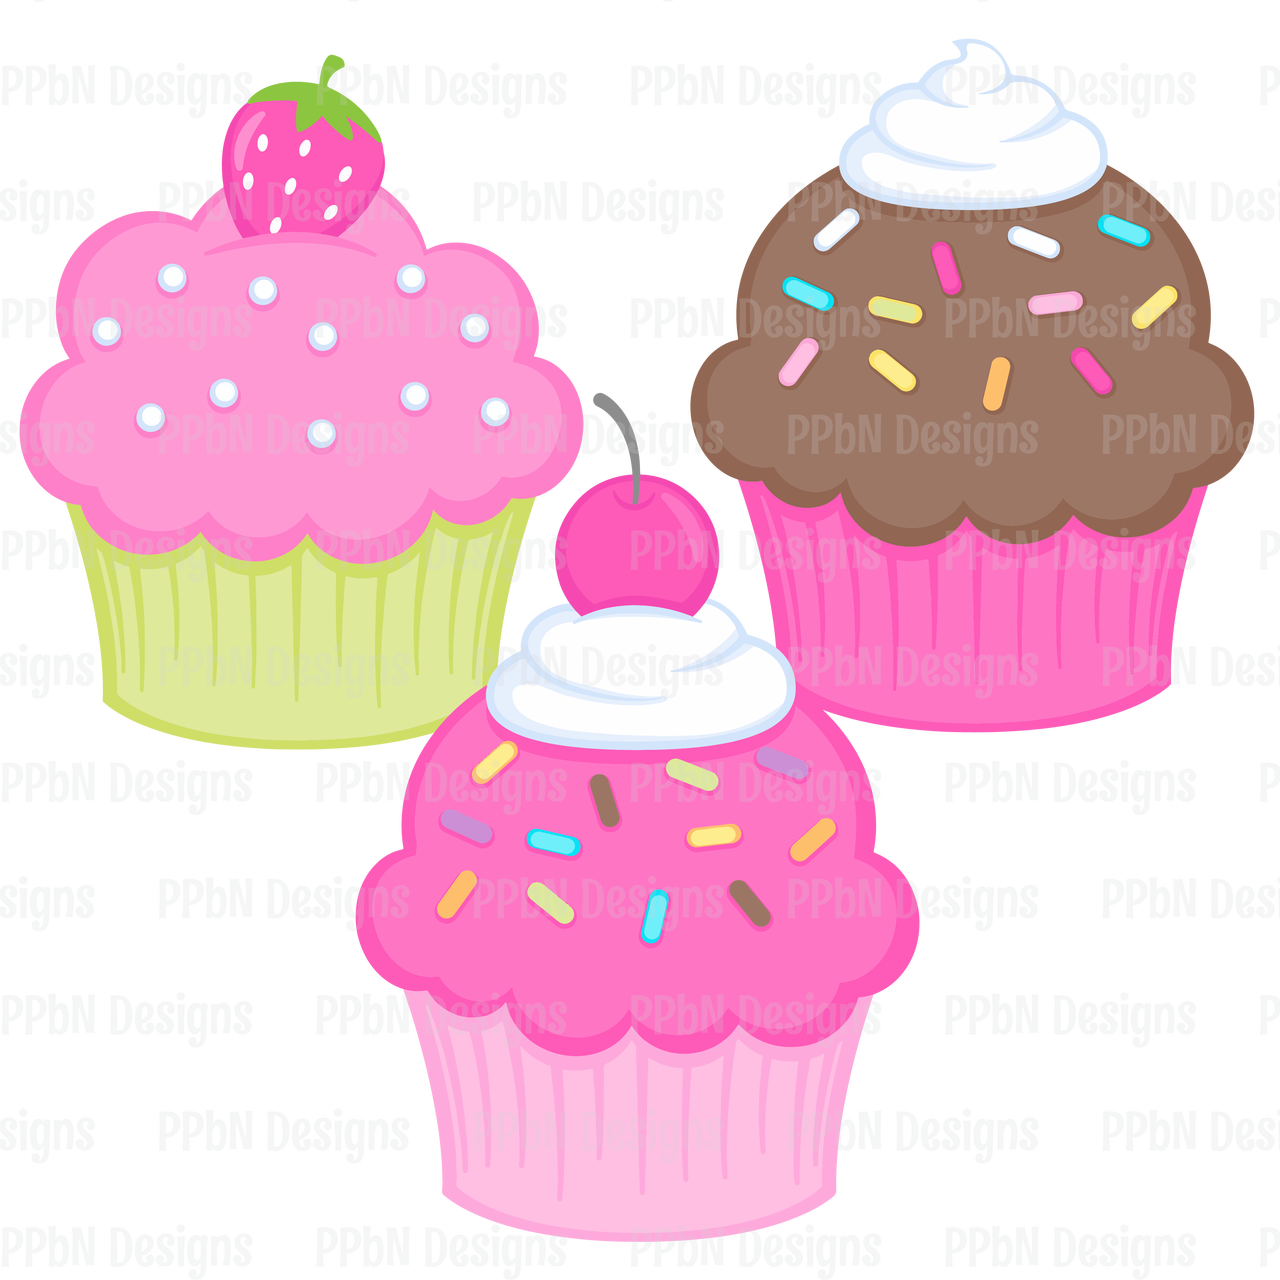 Pin von Nena Xiiömii XDL auf Cup-Cakes | Pinterest | Süß